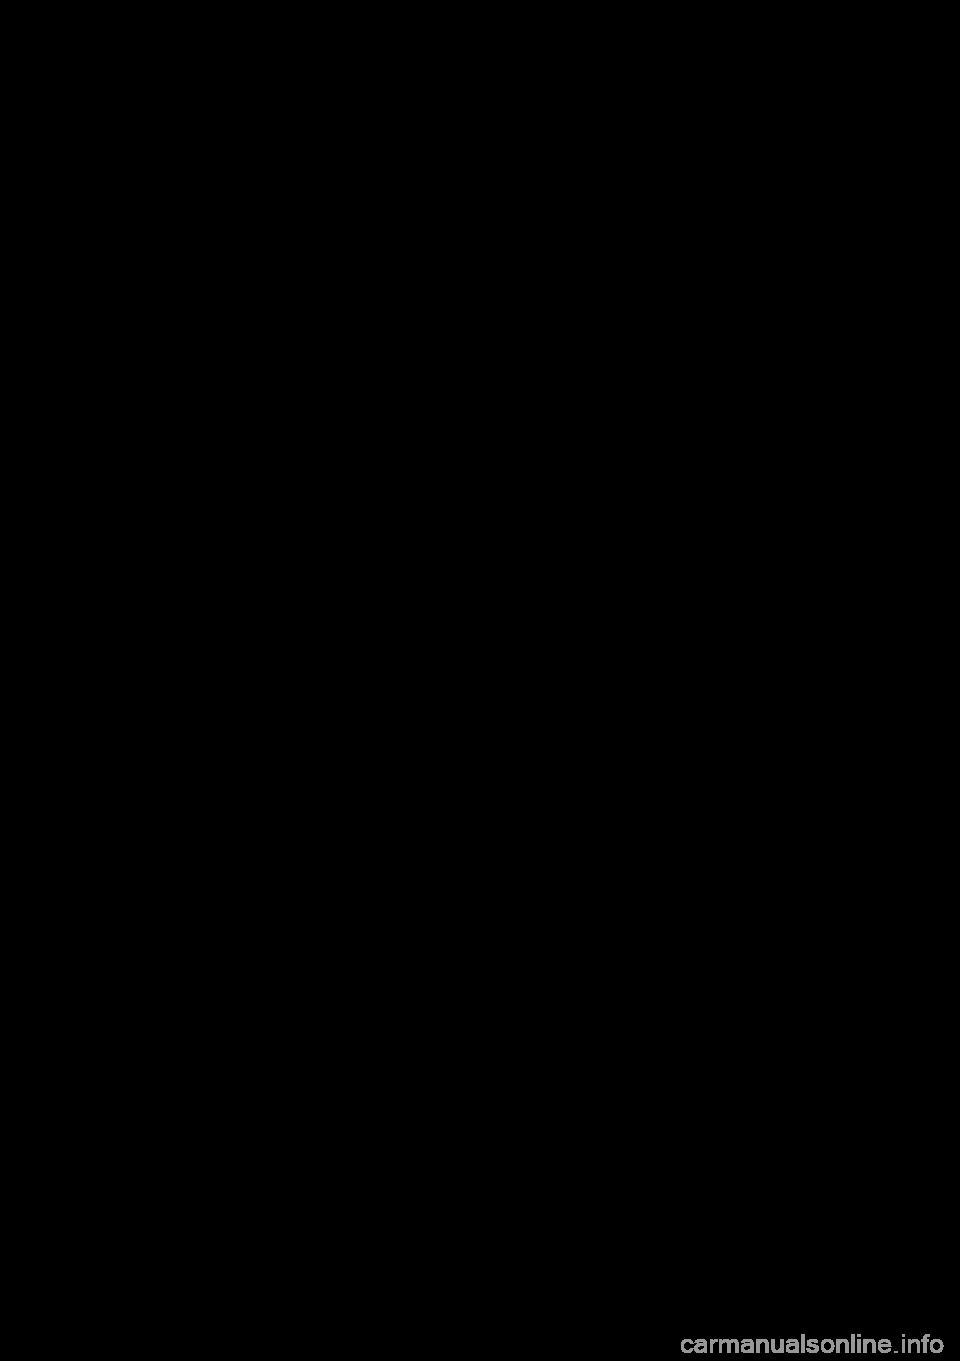 SUZUKI GRAND VITARA 2005 2 G